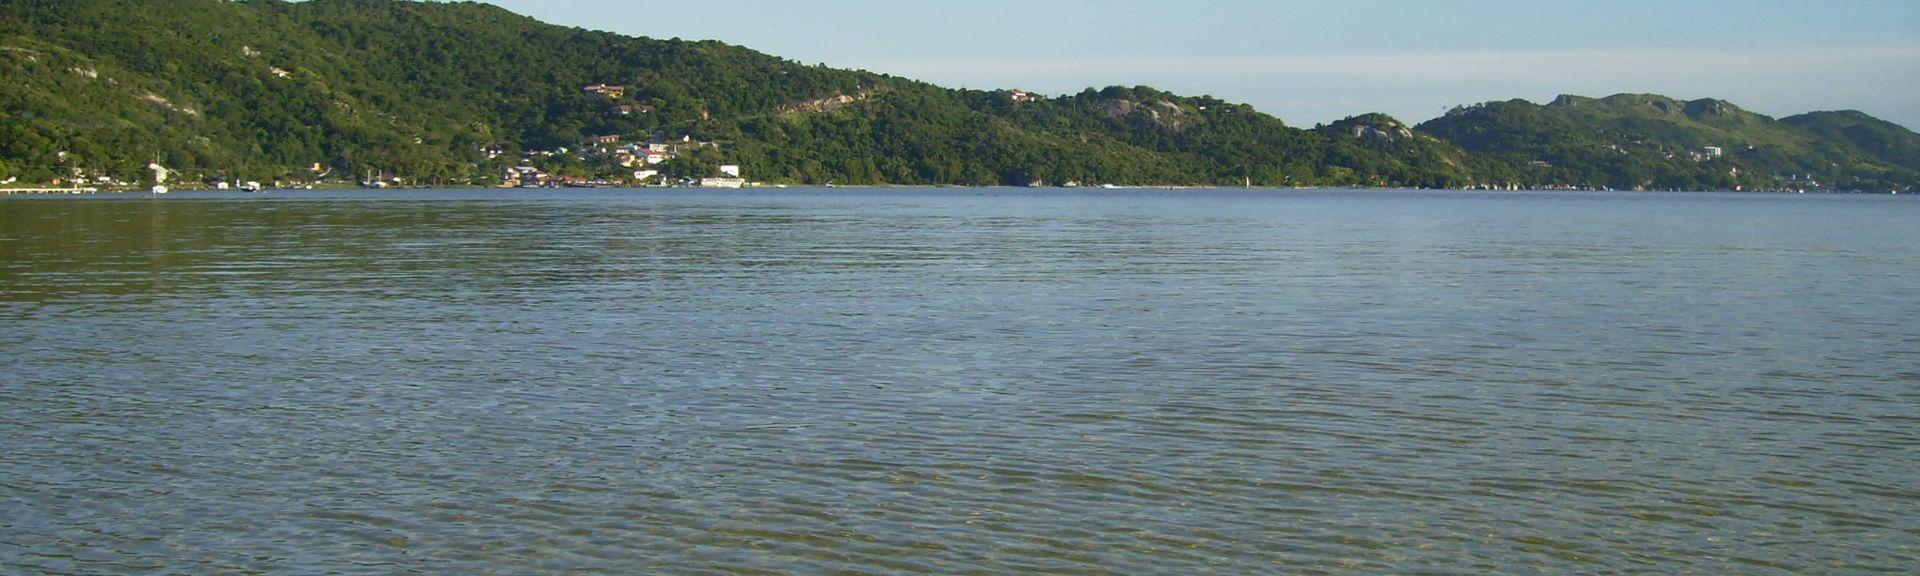 Barra da Lagoa, Florianópolis, Santa Catarina, Brasil